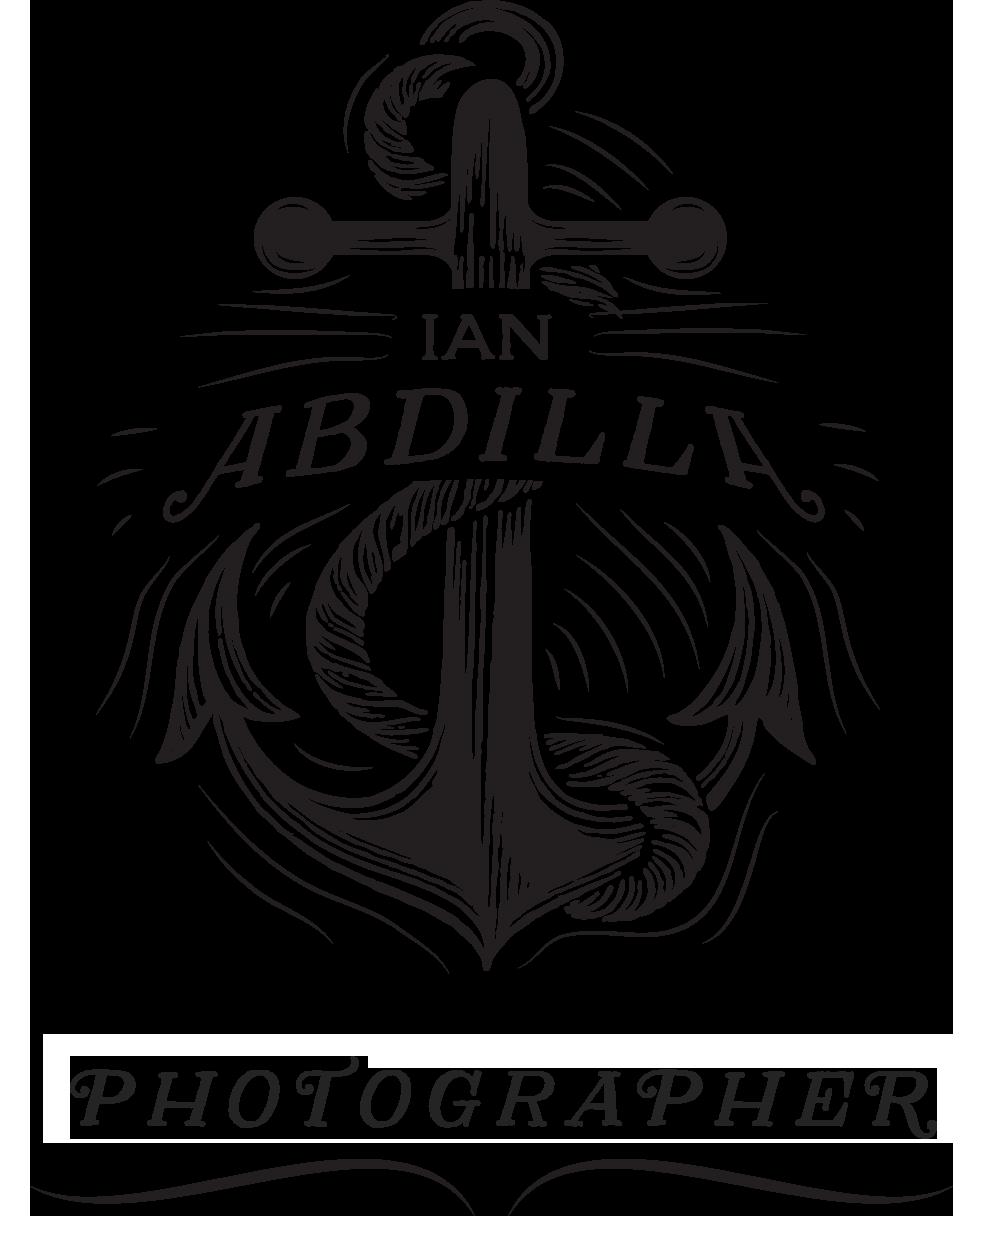 Ian Abdilla